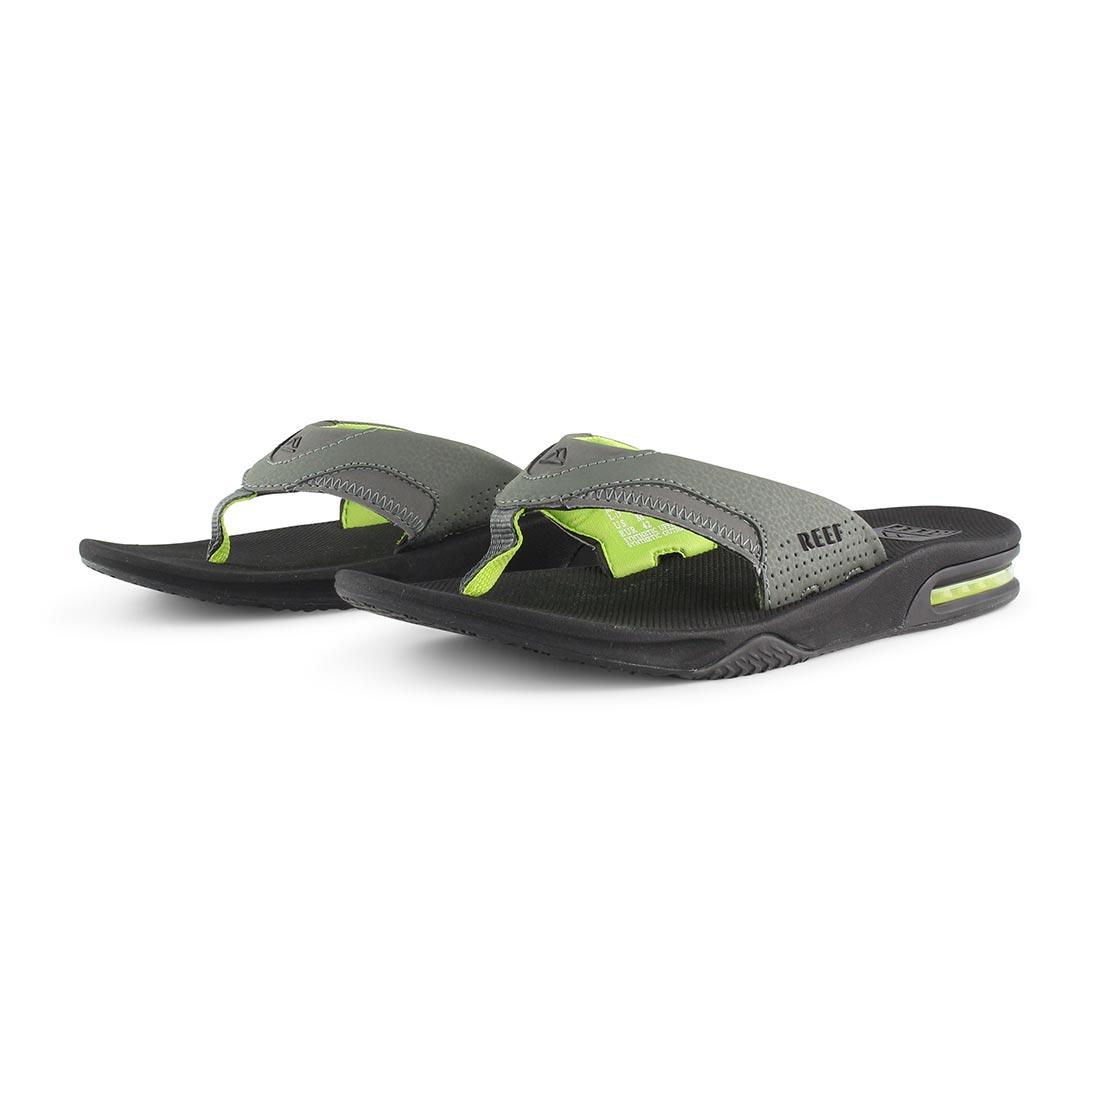 e1eba9bf69ff reef fanning green Reef Fanning Sandals - Black   Green